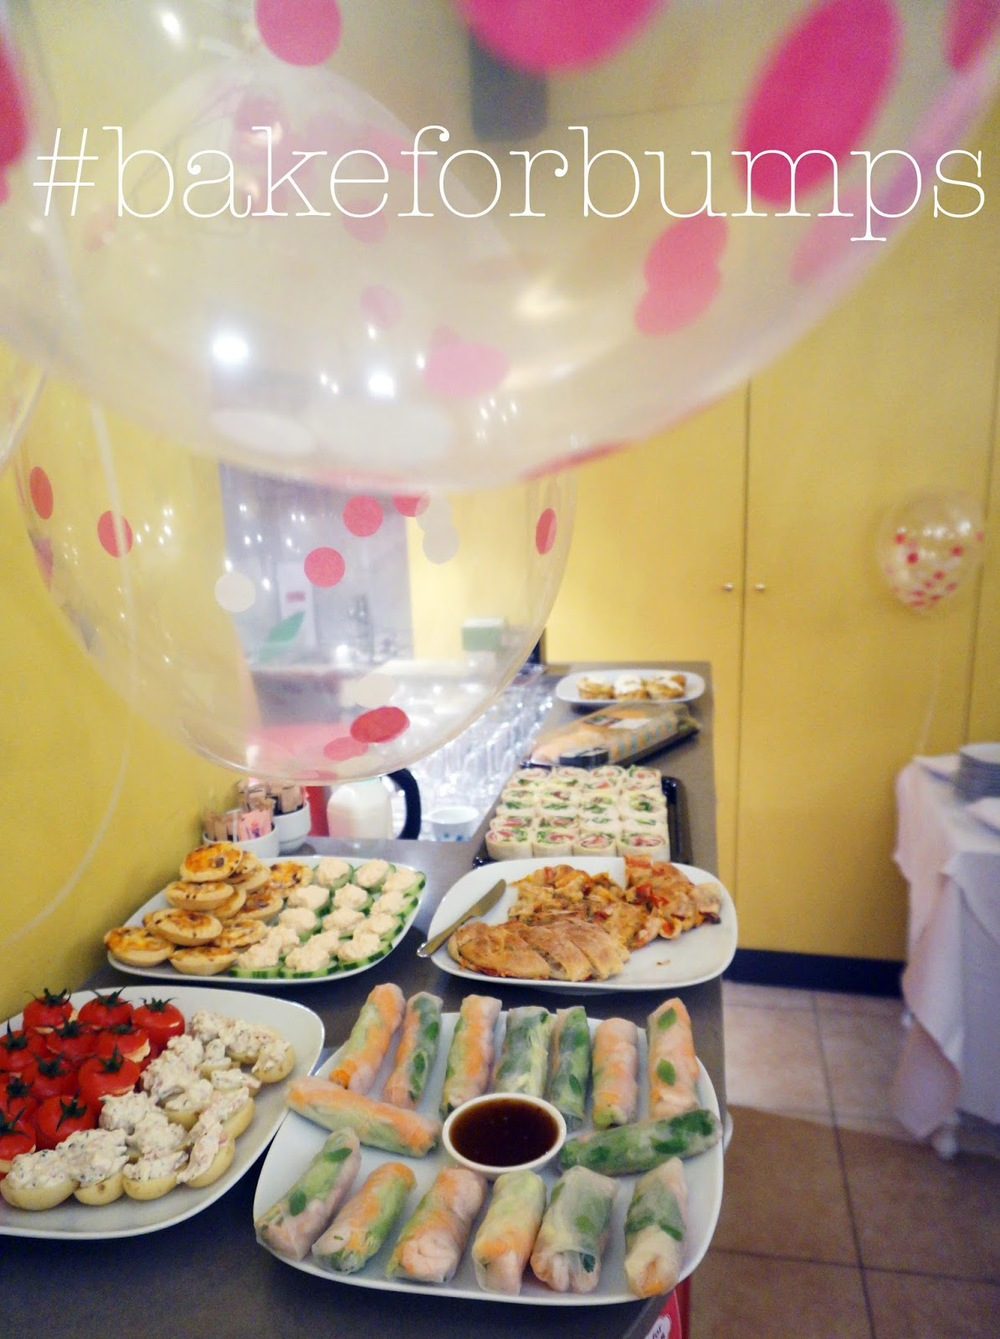 meg-made bloggers bake for bumps #bakeforbumps